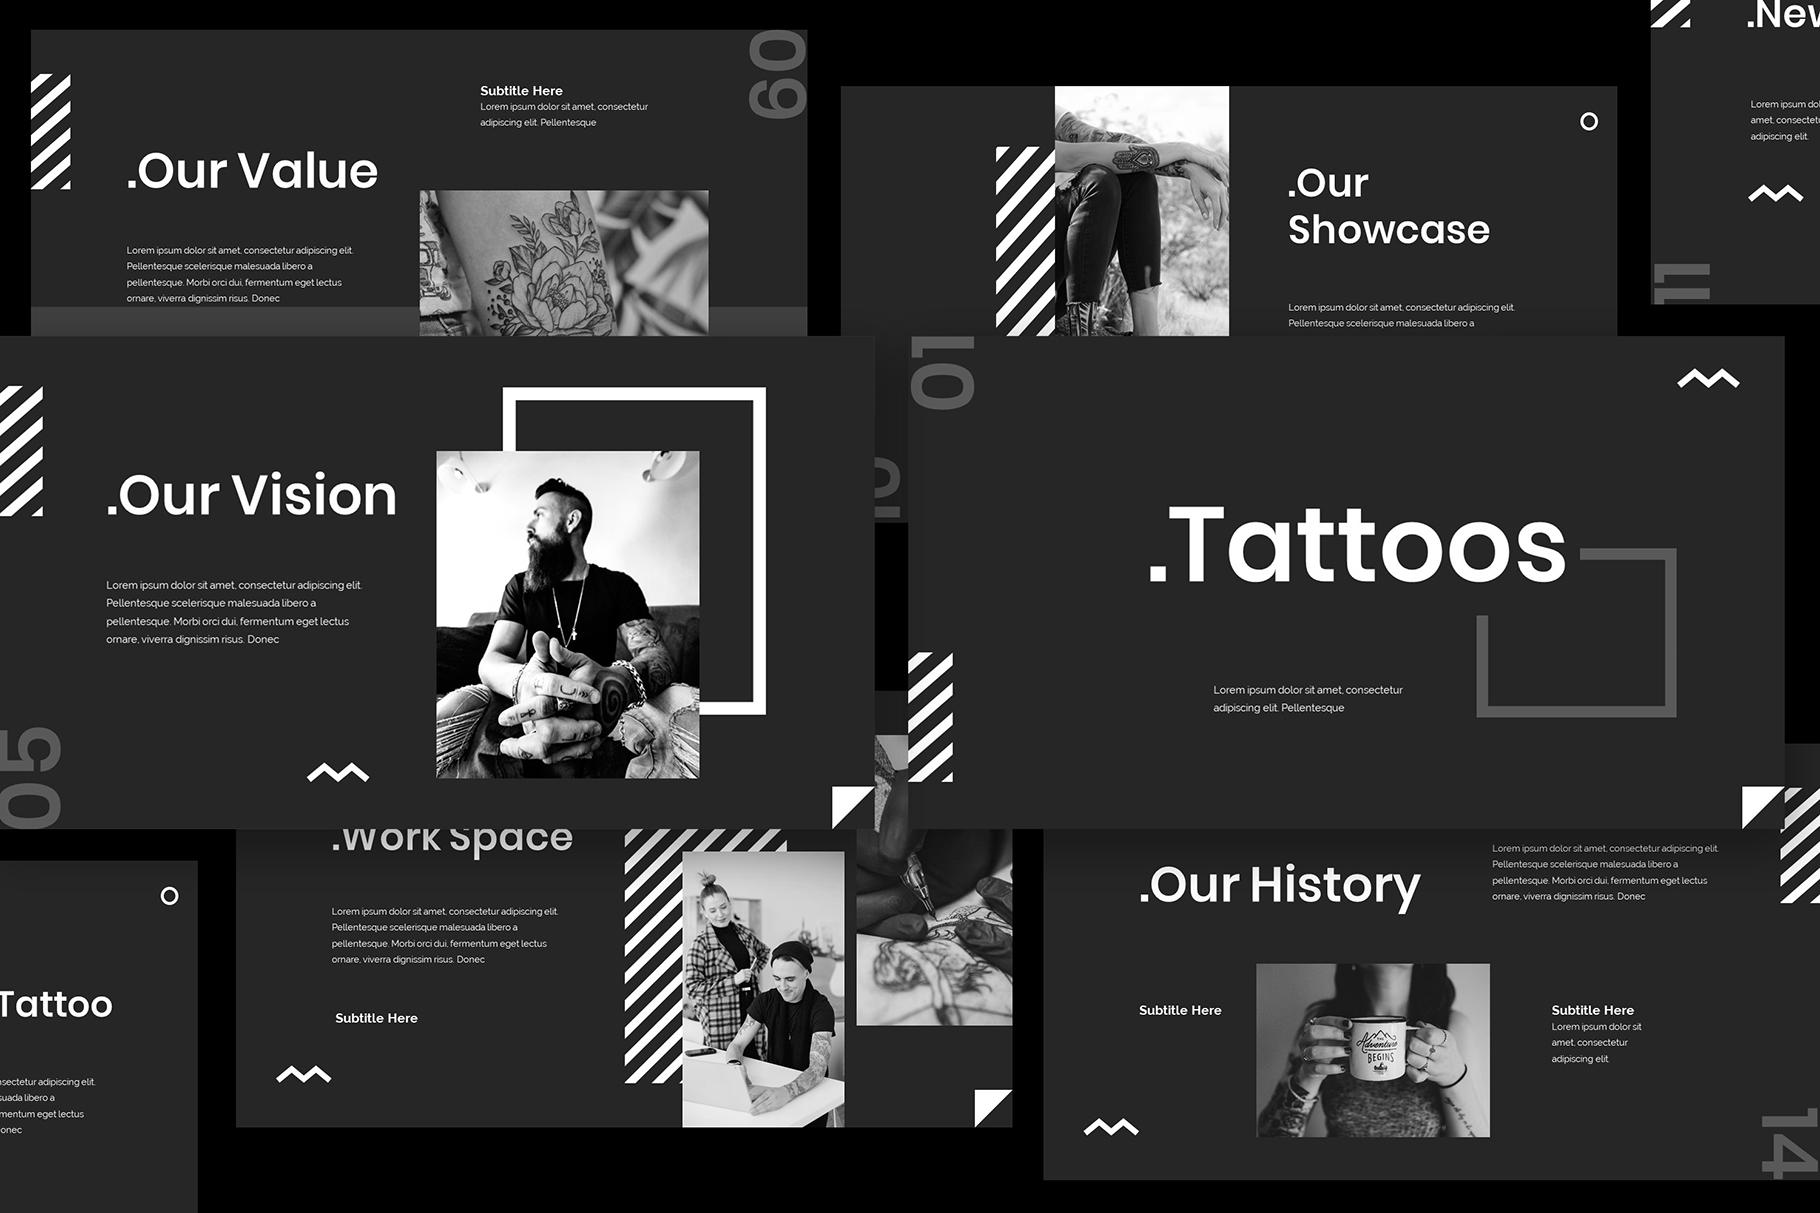 Tattoo Google Slides Presentation example image 3